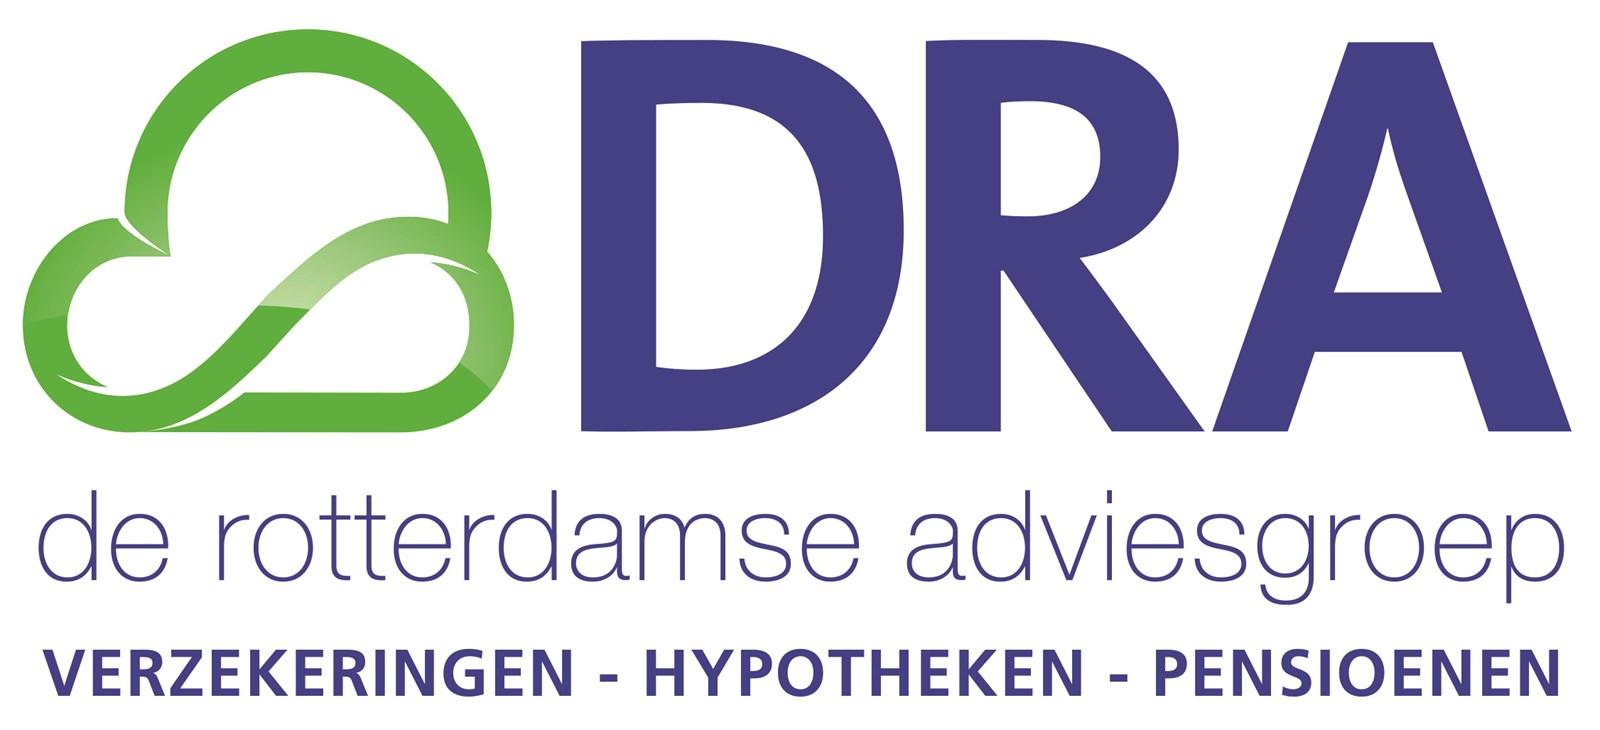 Logo van De Rotterdamse Adviesgroep (DRA)